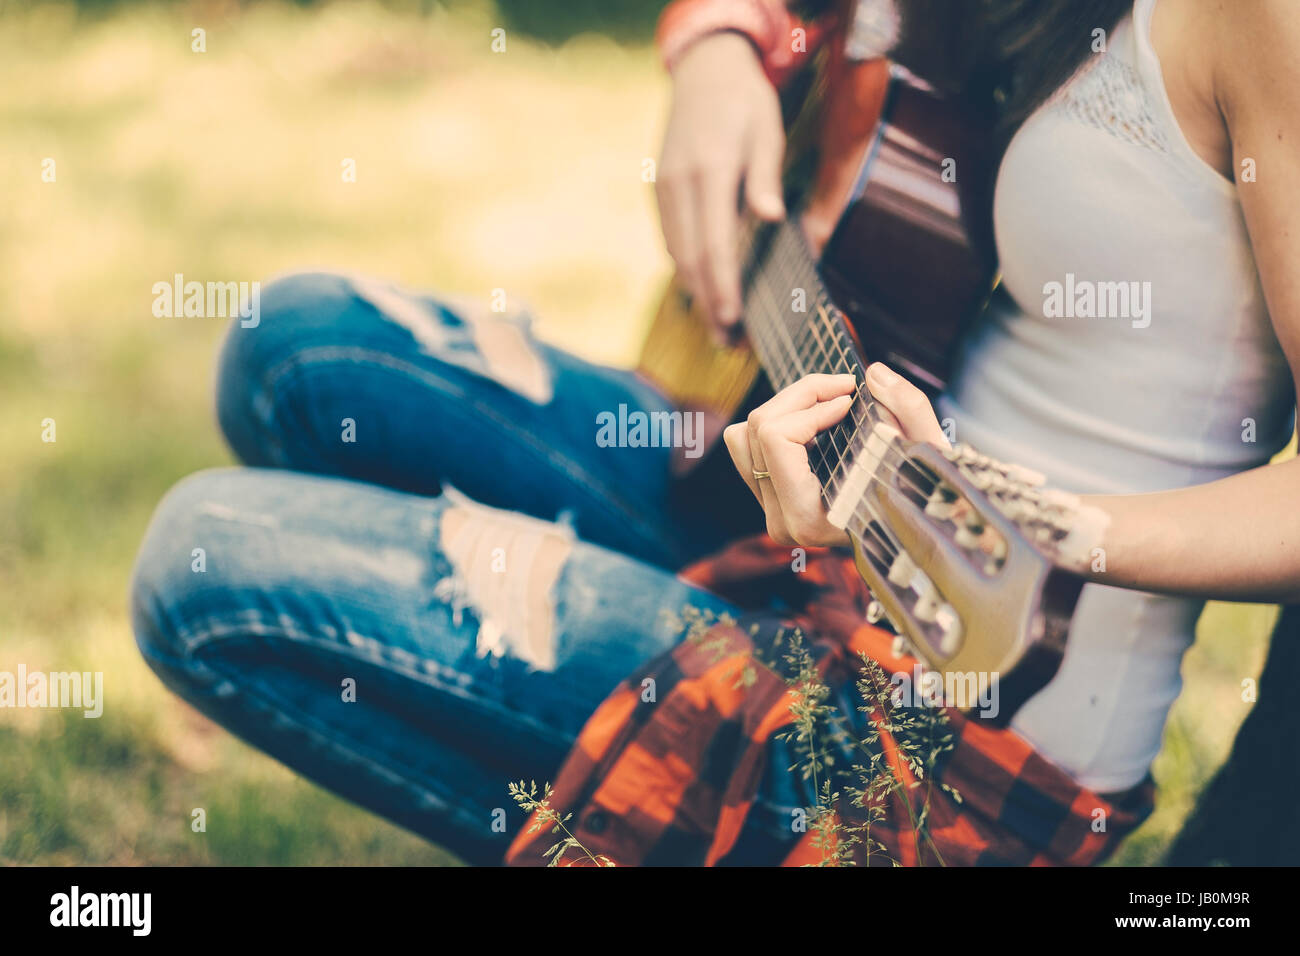 Festival Frau mit Gitarre auf party Stockfoto